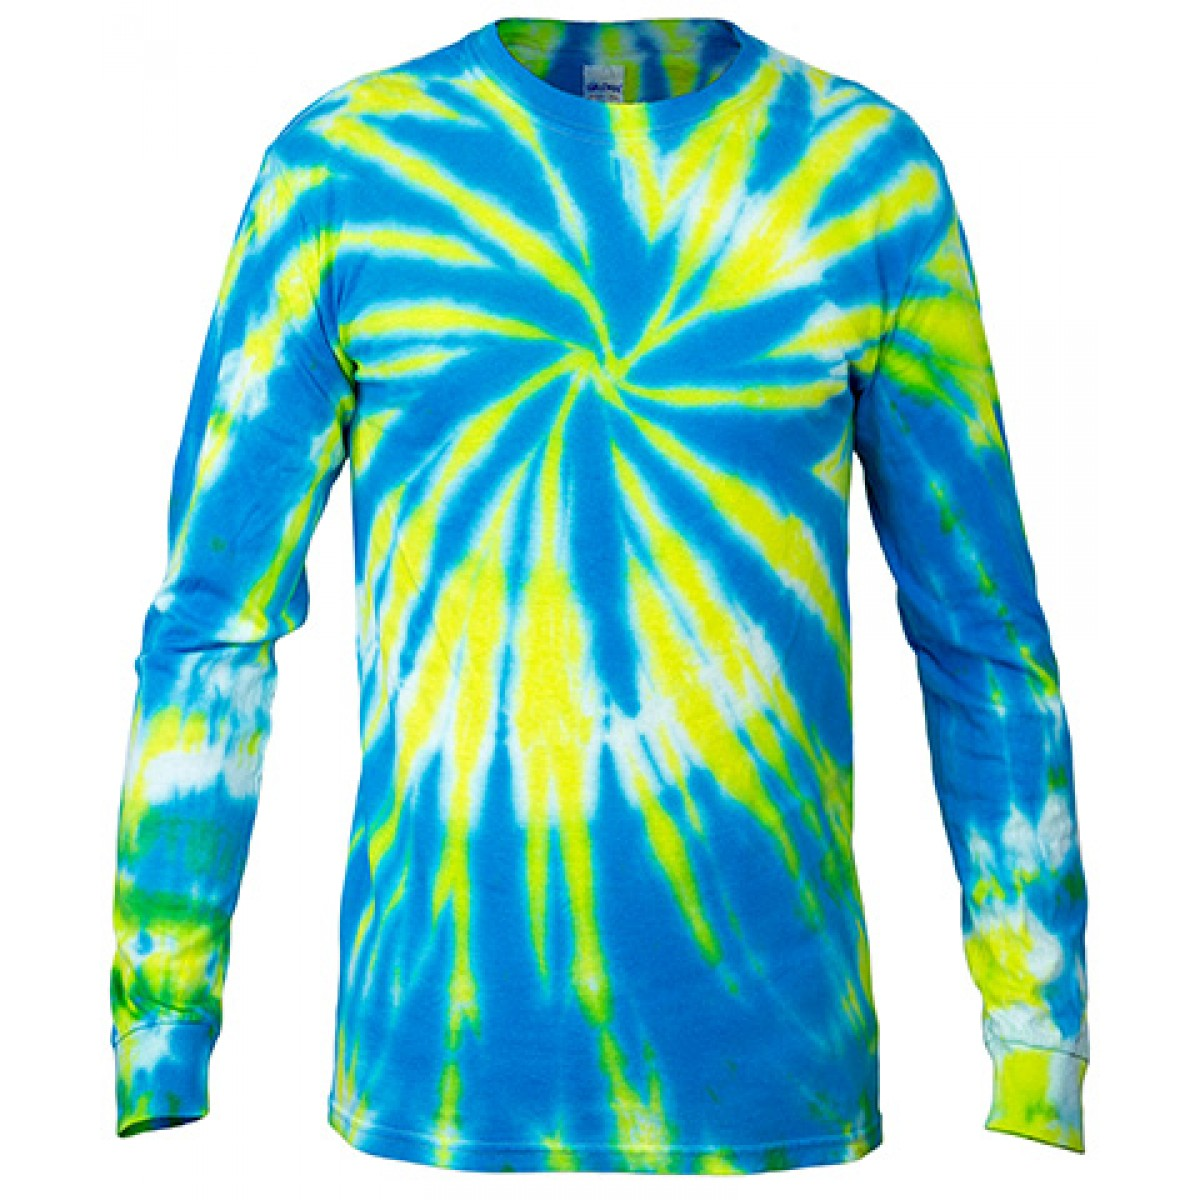 Multi Color Tie-Dye Long Sleeve Shirt -Blue-3XL